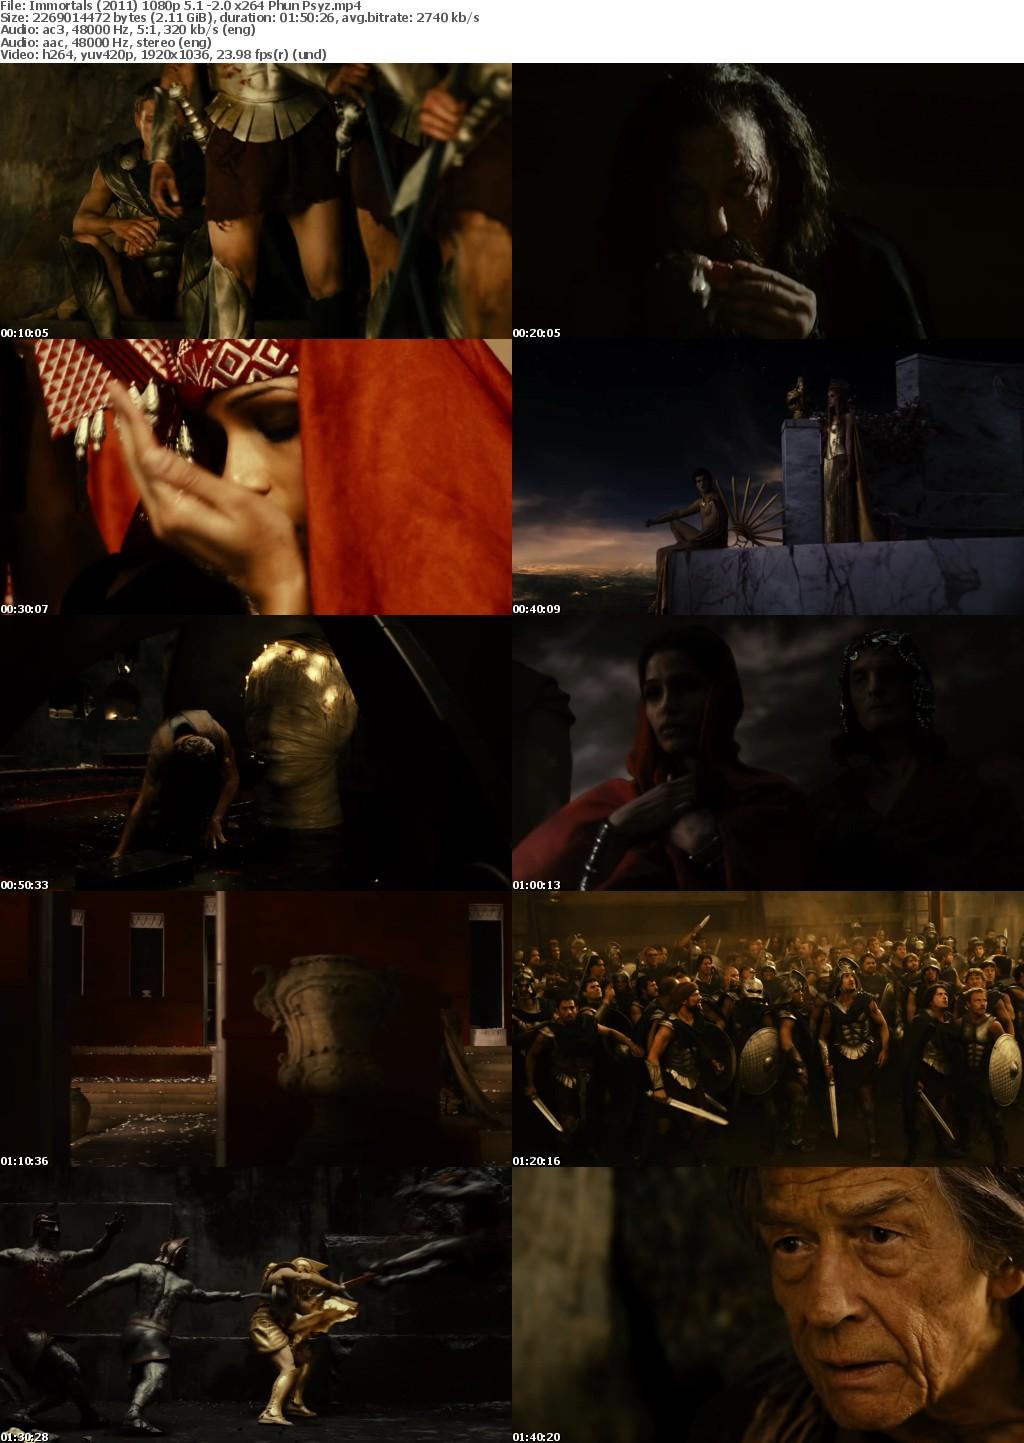 Immortals (2011) 1080p BRRip 5.1 -2.0 x264-Phun.Psyz